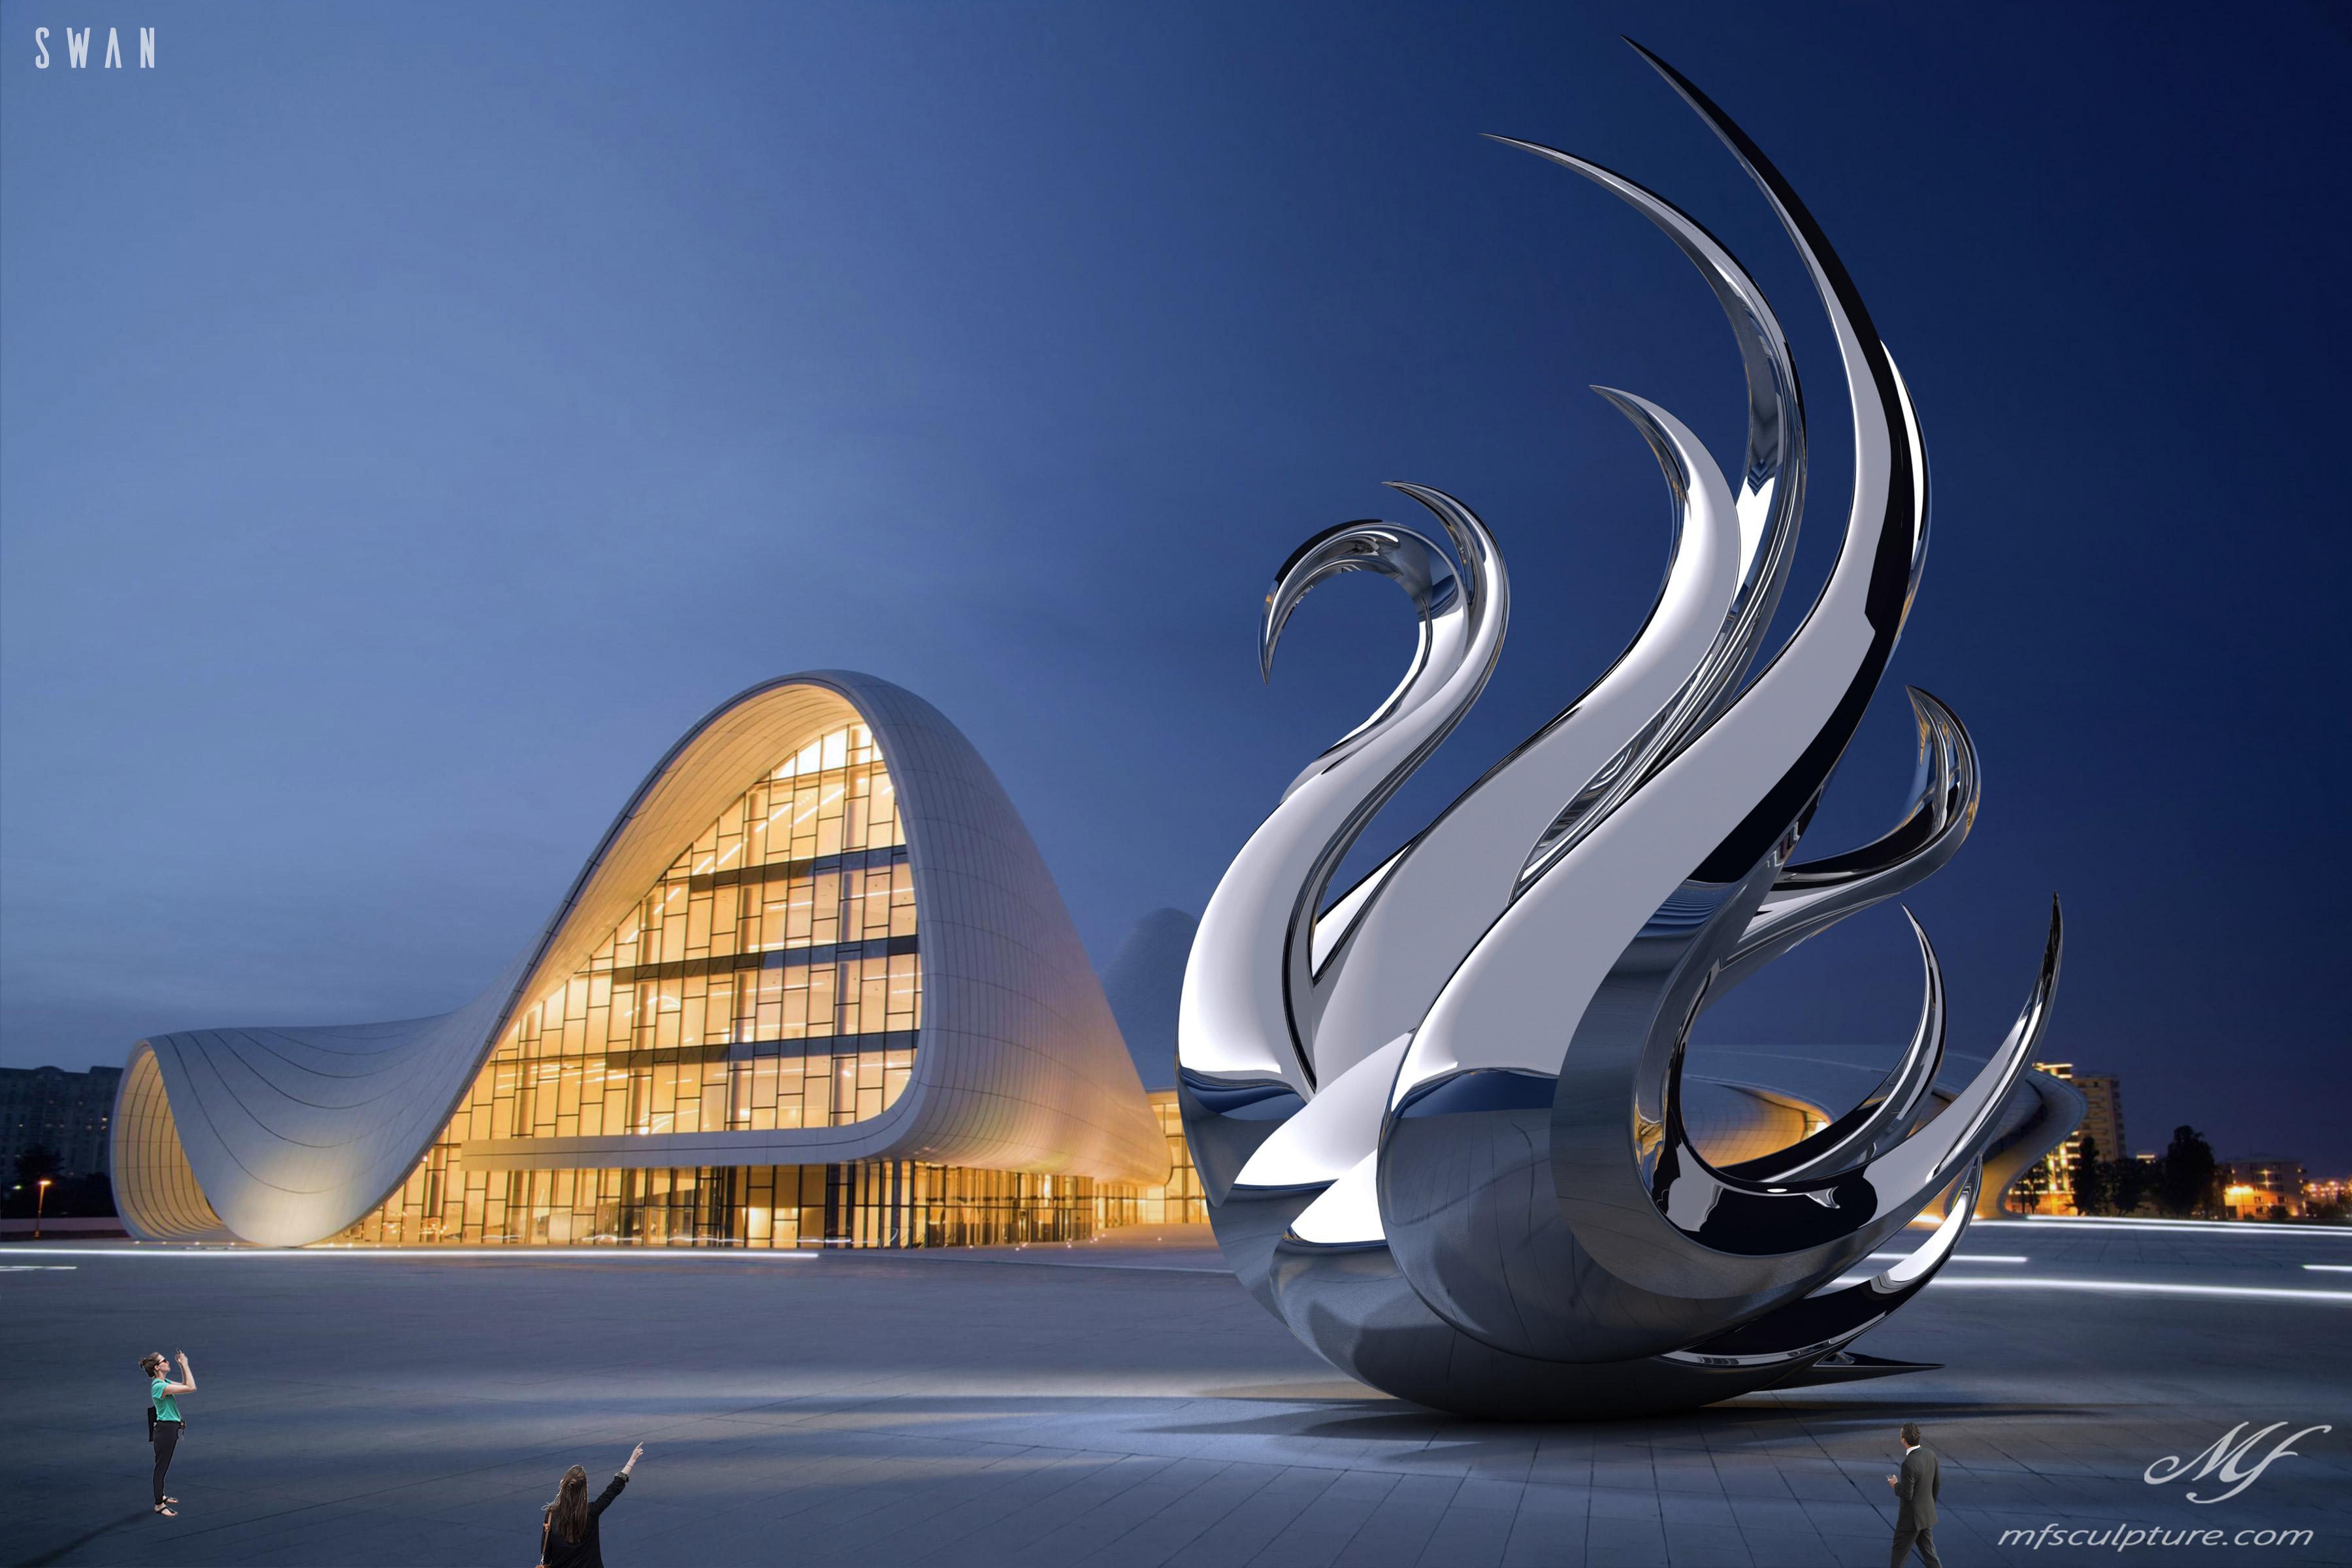 Heydar Aliyev Zaha Hadid Convergence Modern Sculpture Public Art Swan Contemporary 1